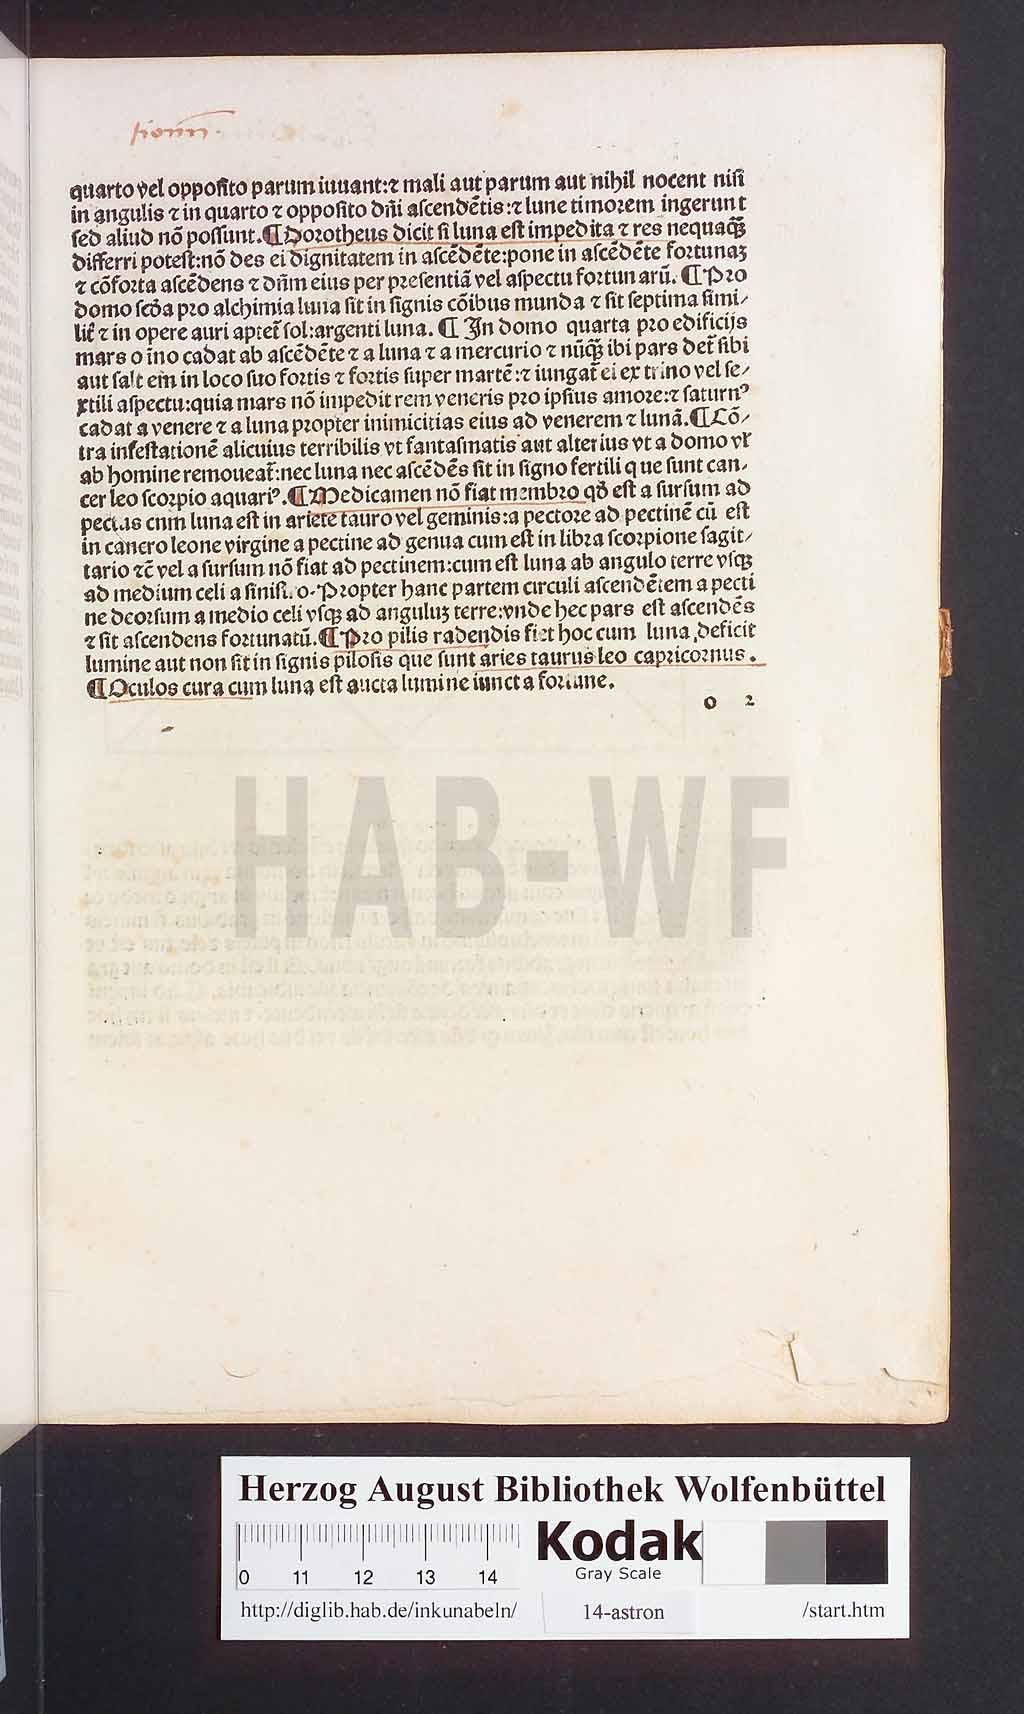 http://diglib.hab.de/inkunabeln/14-astron/00215.jpg